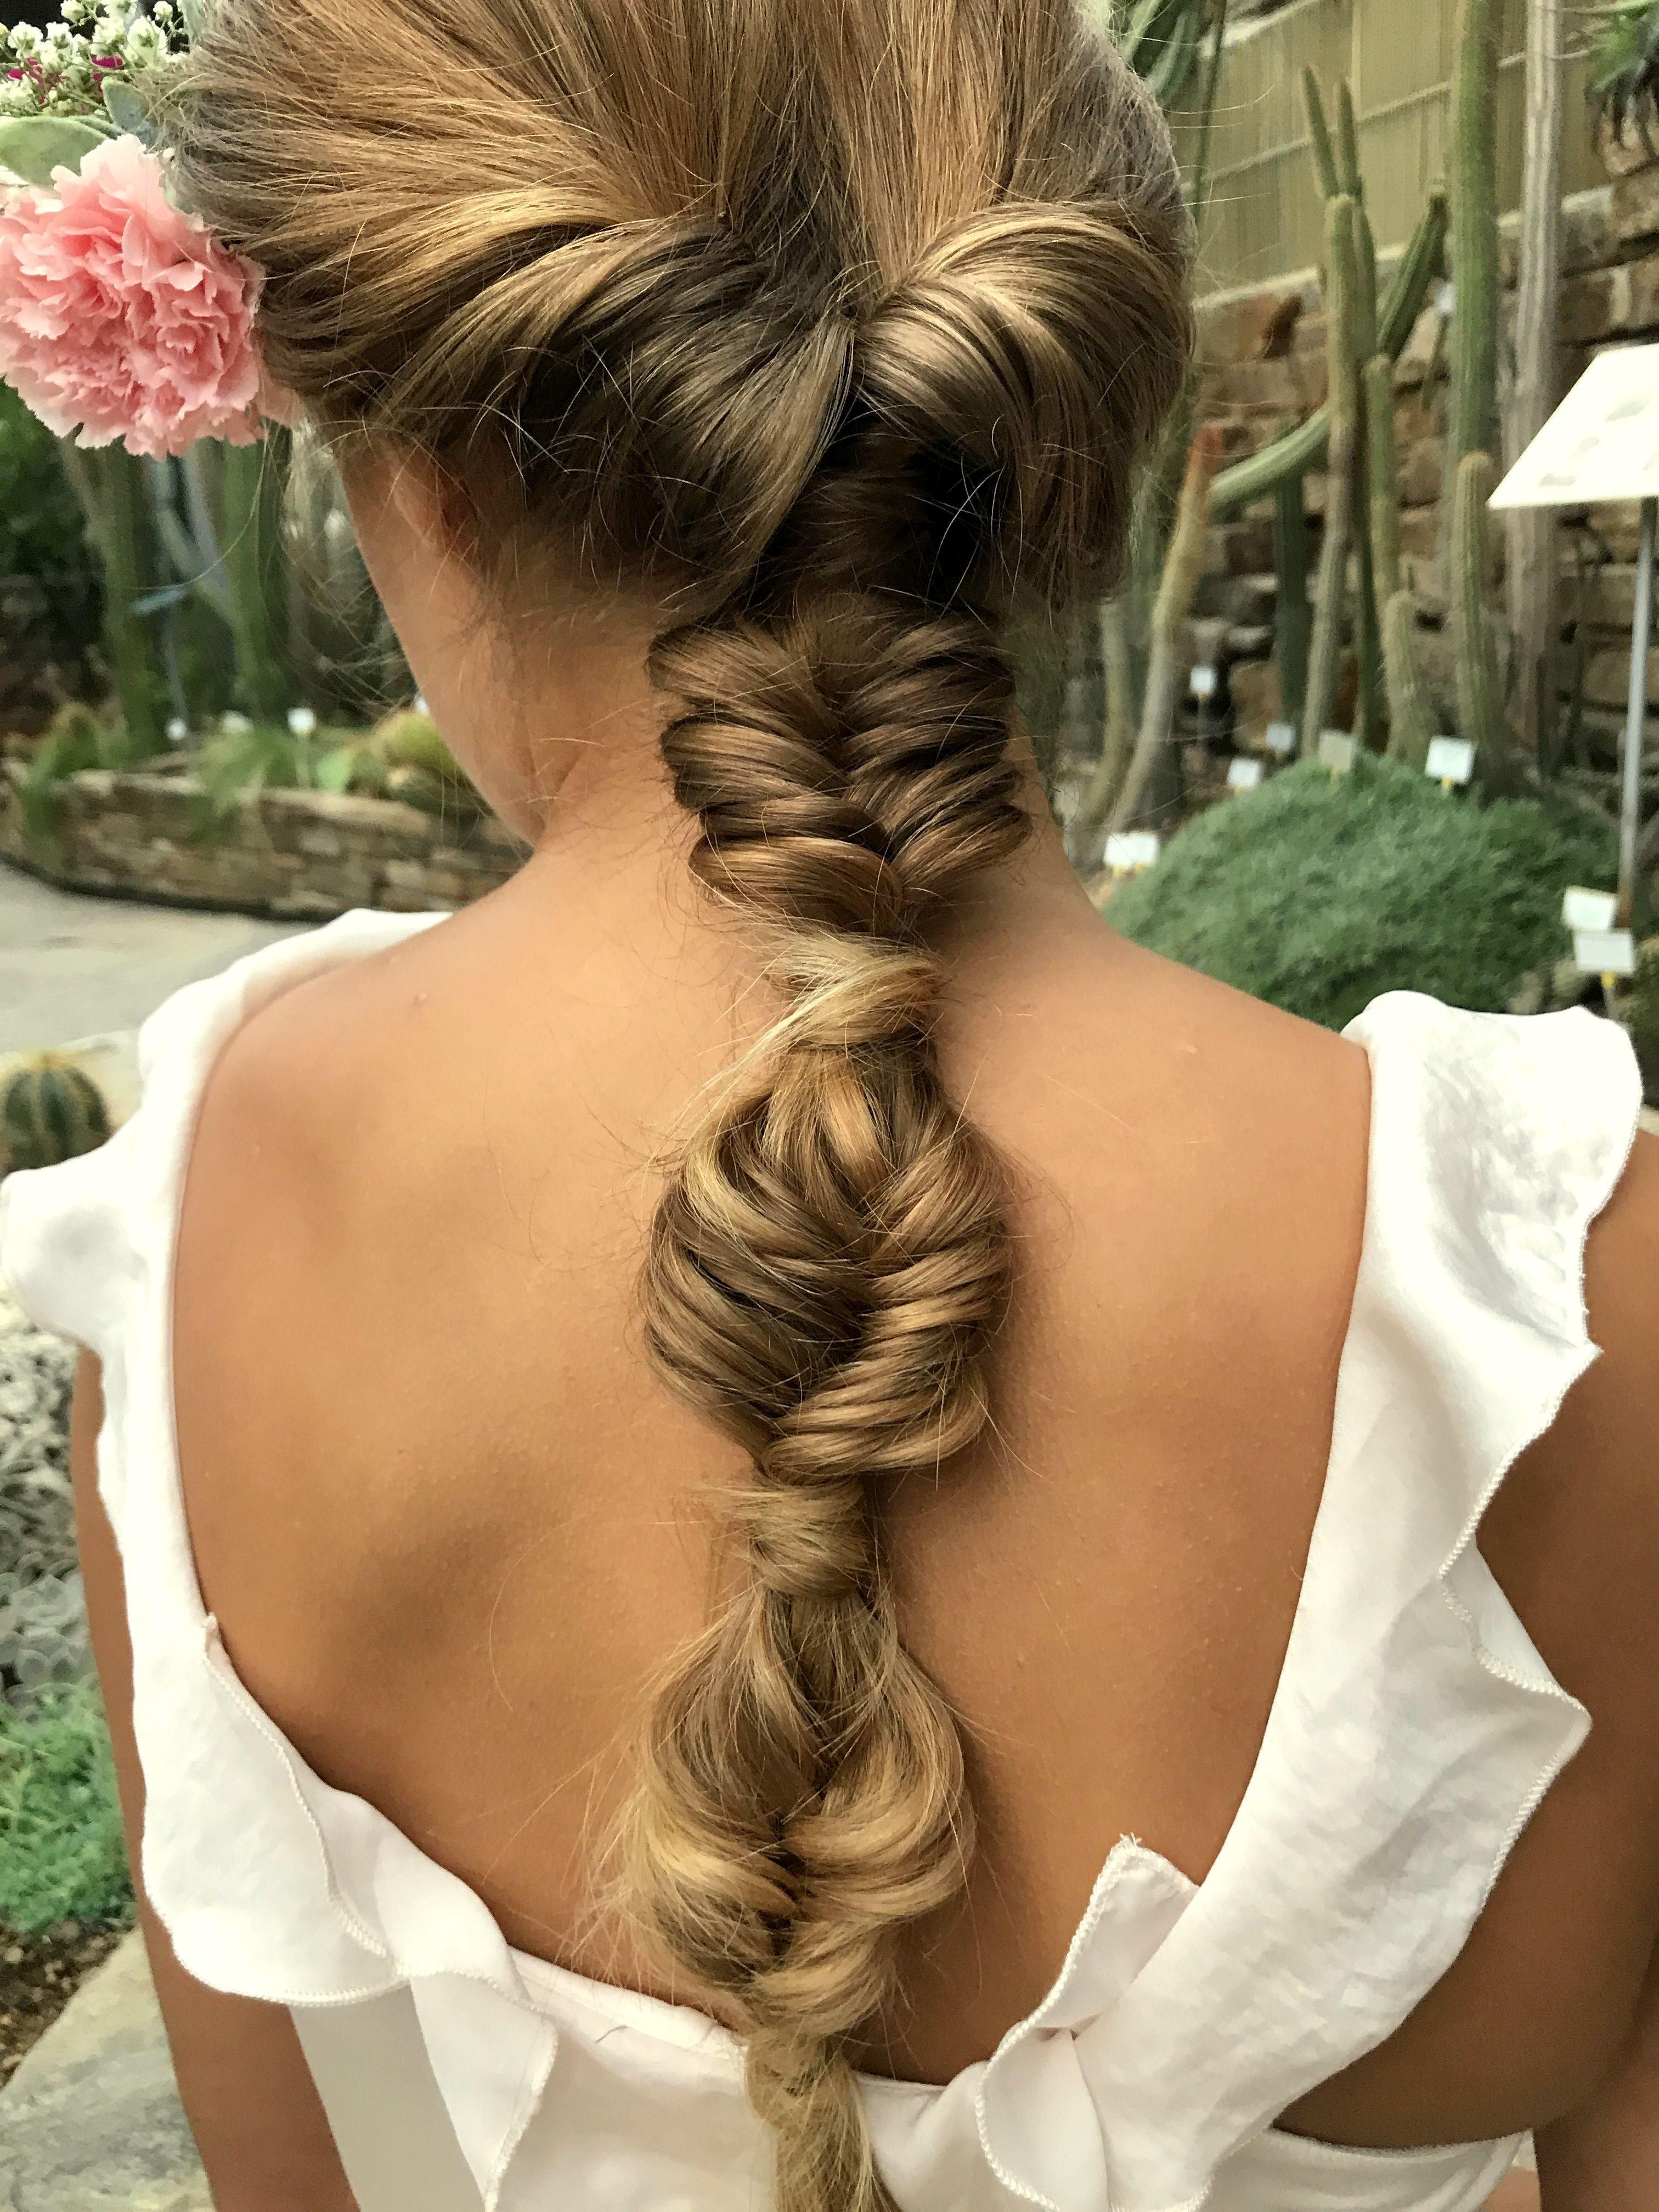 Súper fácil peinados para boda Fotos de las tendencias de color de pelo - Peinados de novia Trenzas | Peinados boda pelo largo ...